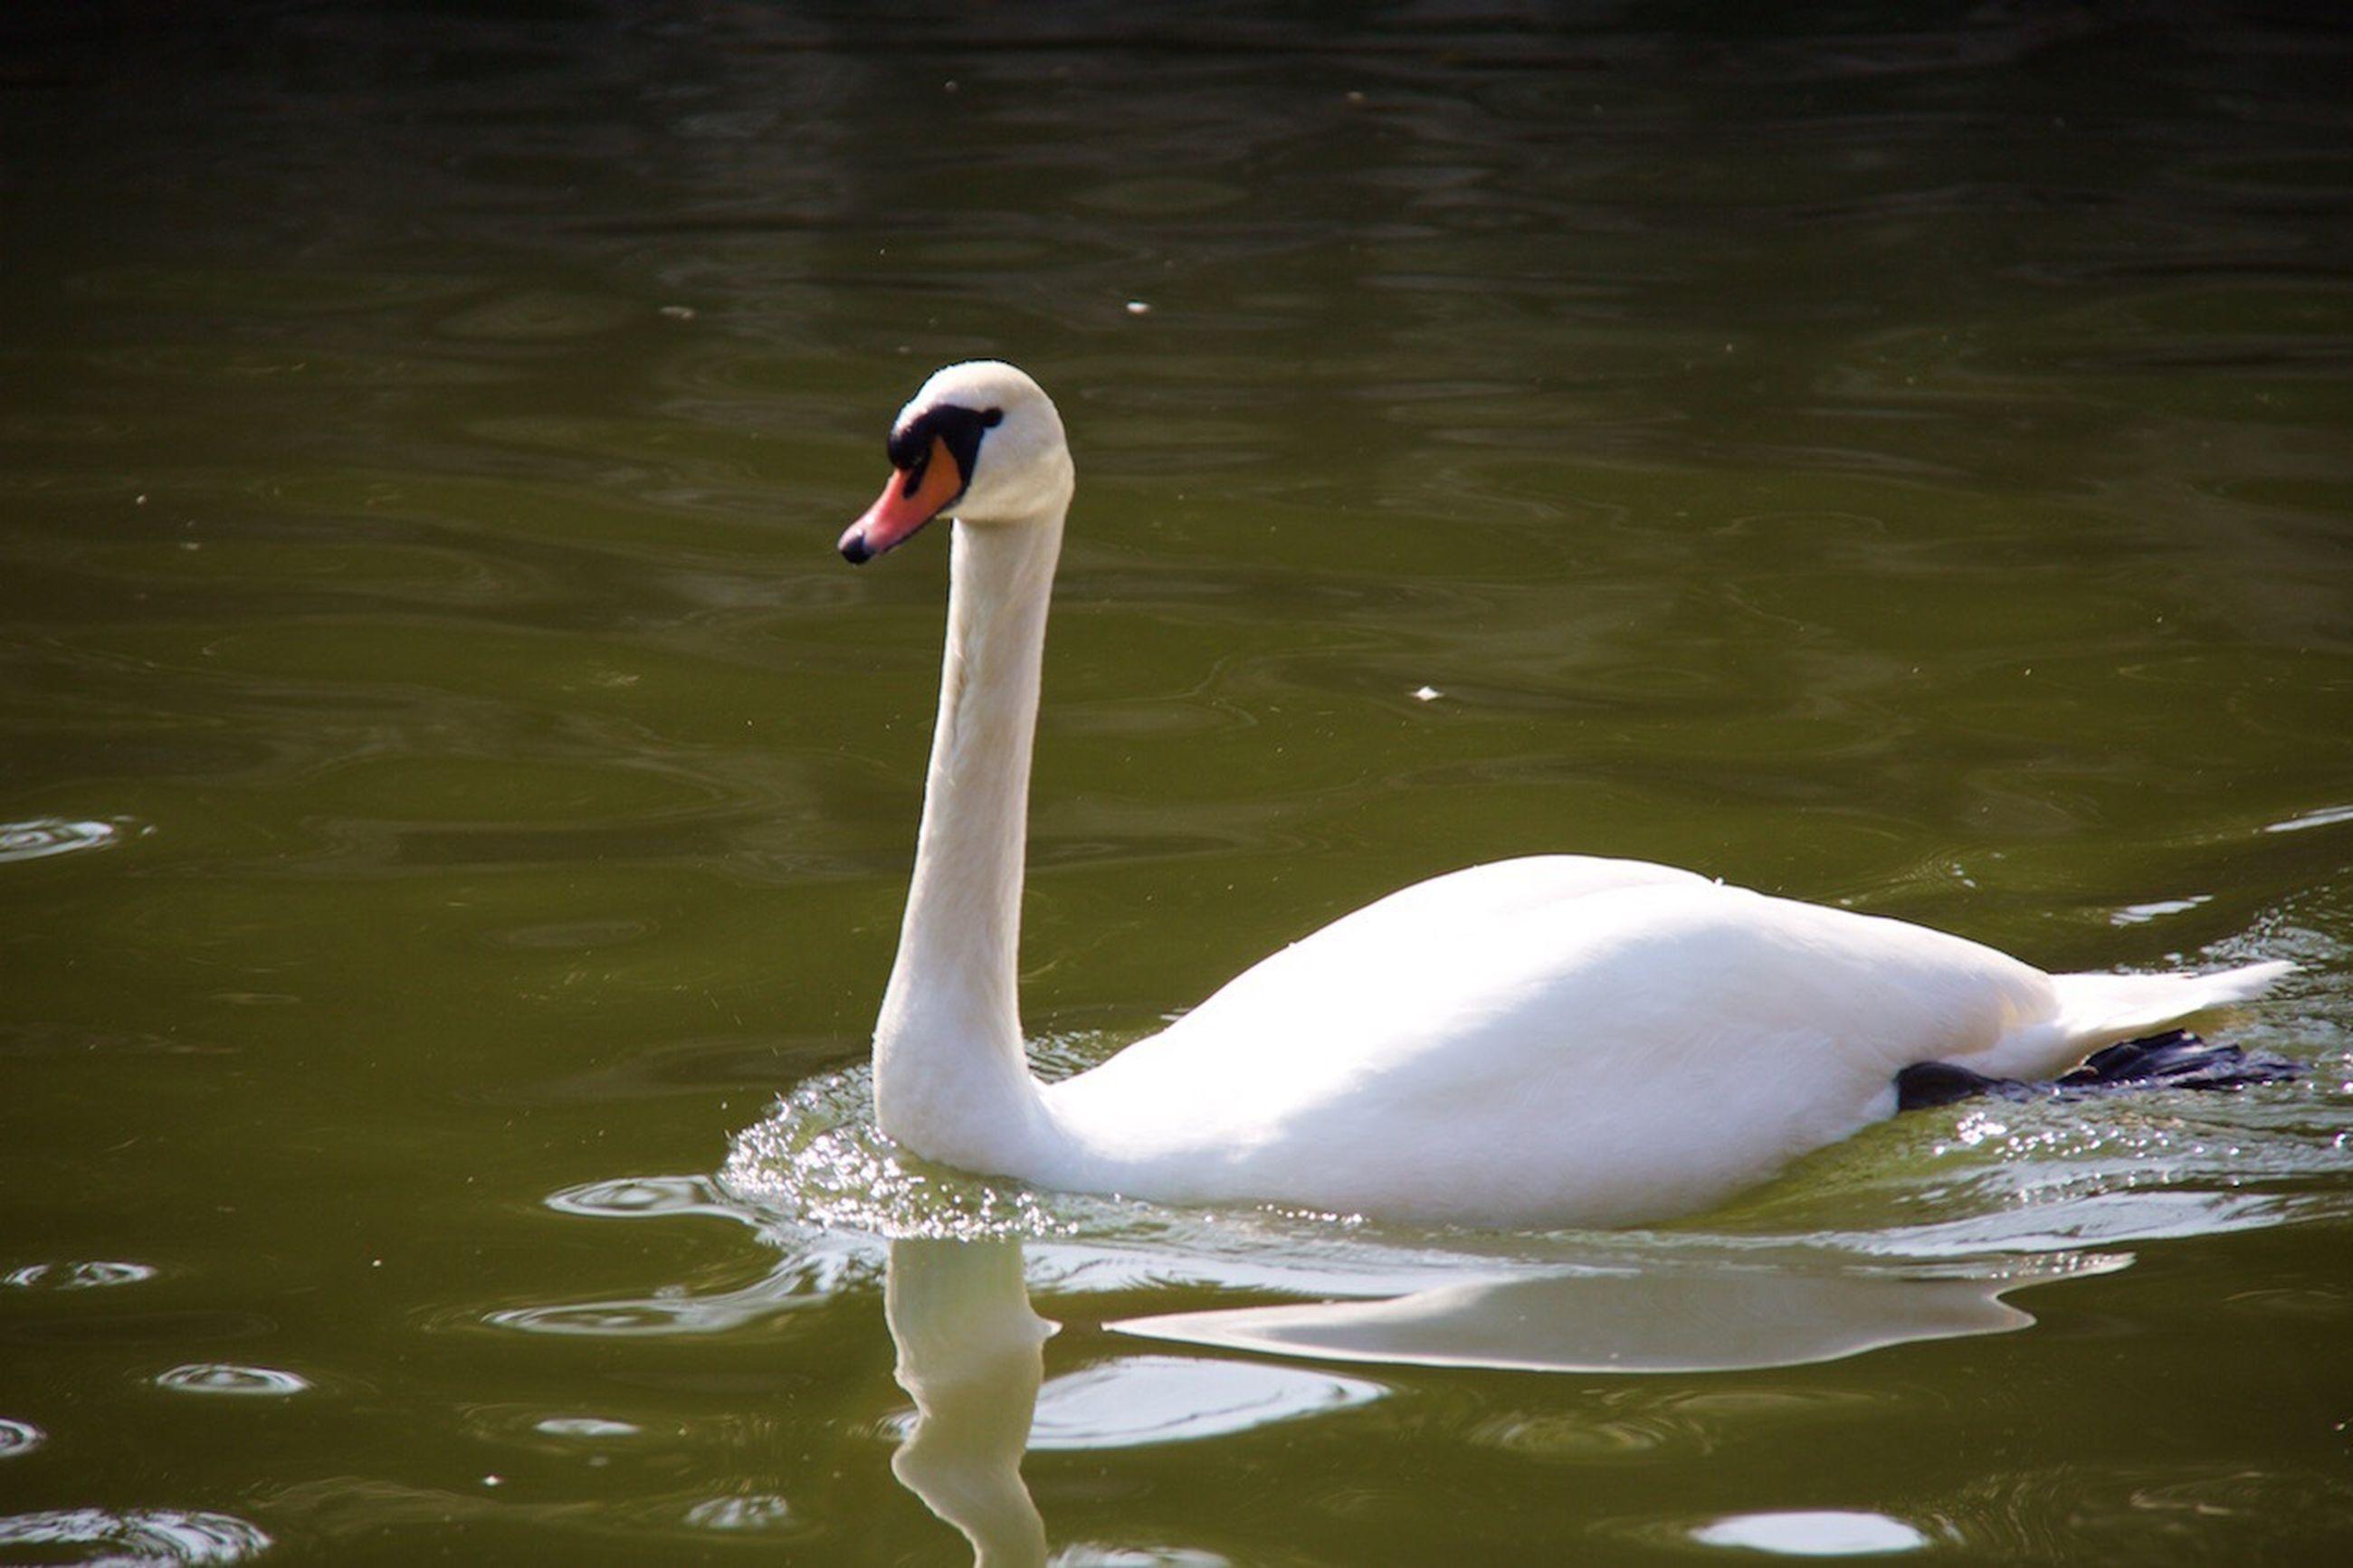 animal themes, bird, water, swan, lake, animals in the wild, swimming, wildlife, waterfront, water bird, reflection, white color, beak, rippled, one animal, animal, two animals, floating on water, nature